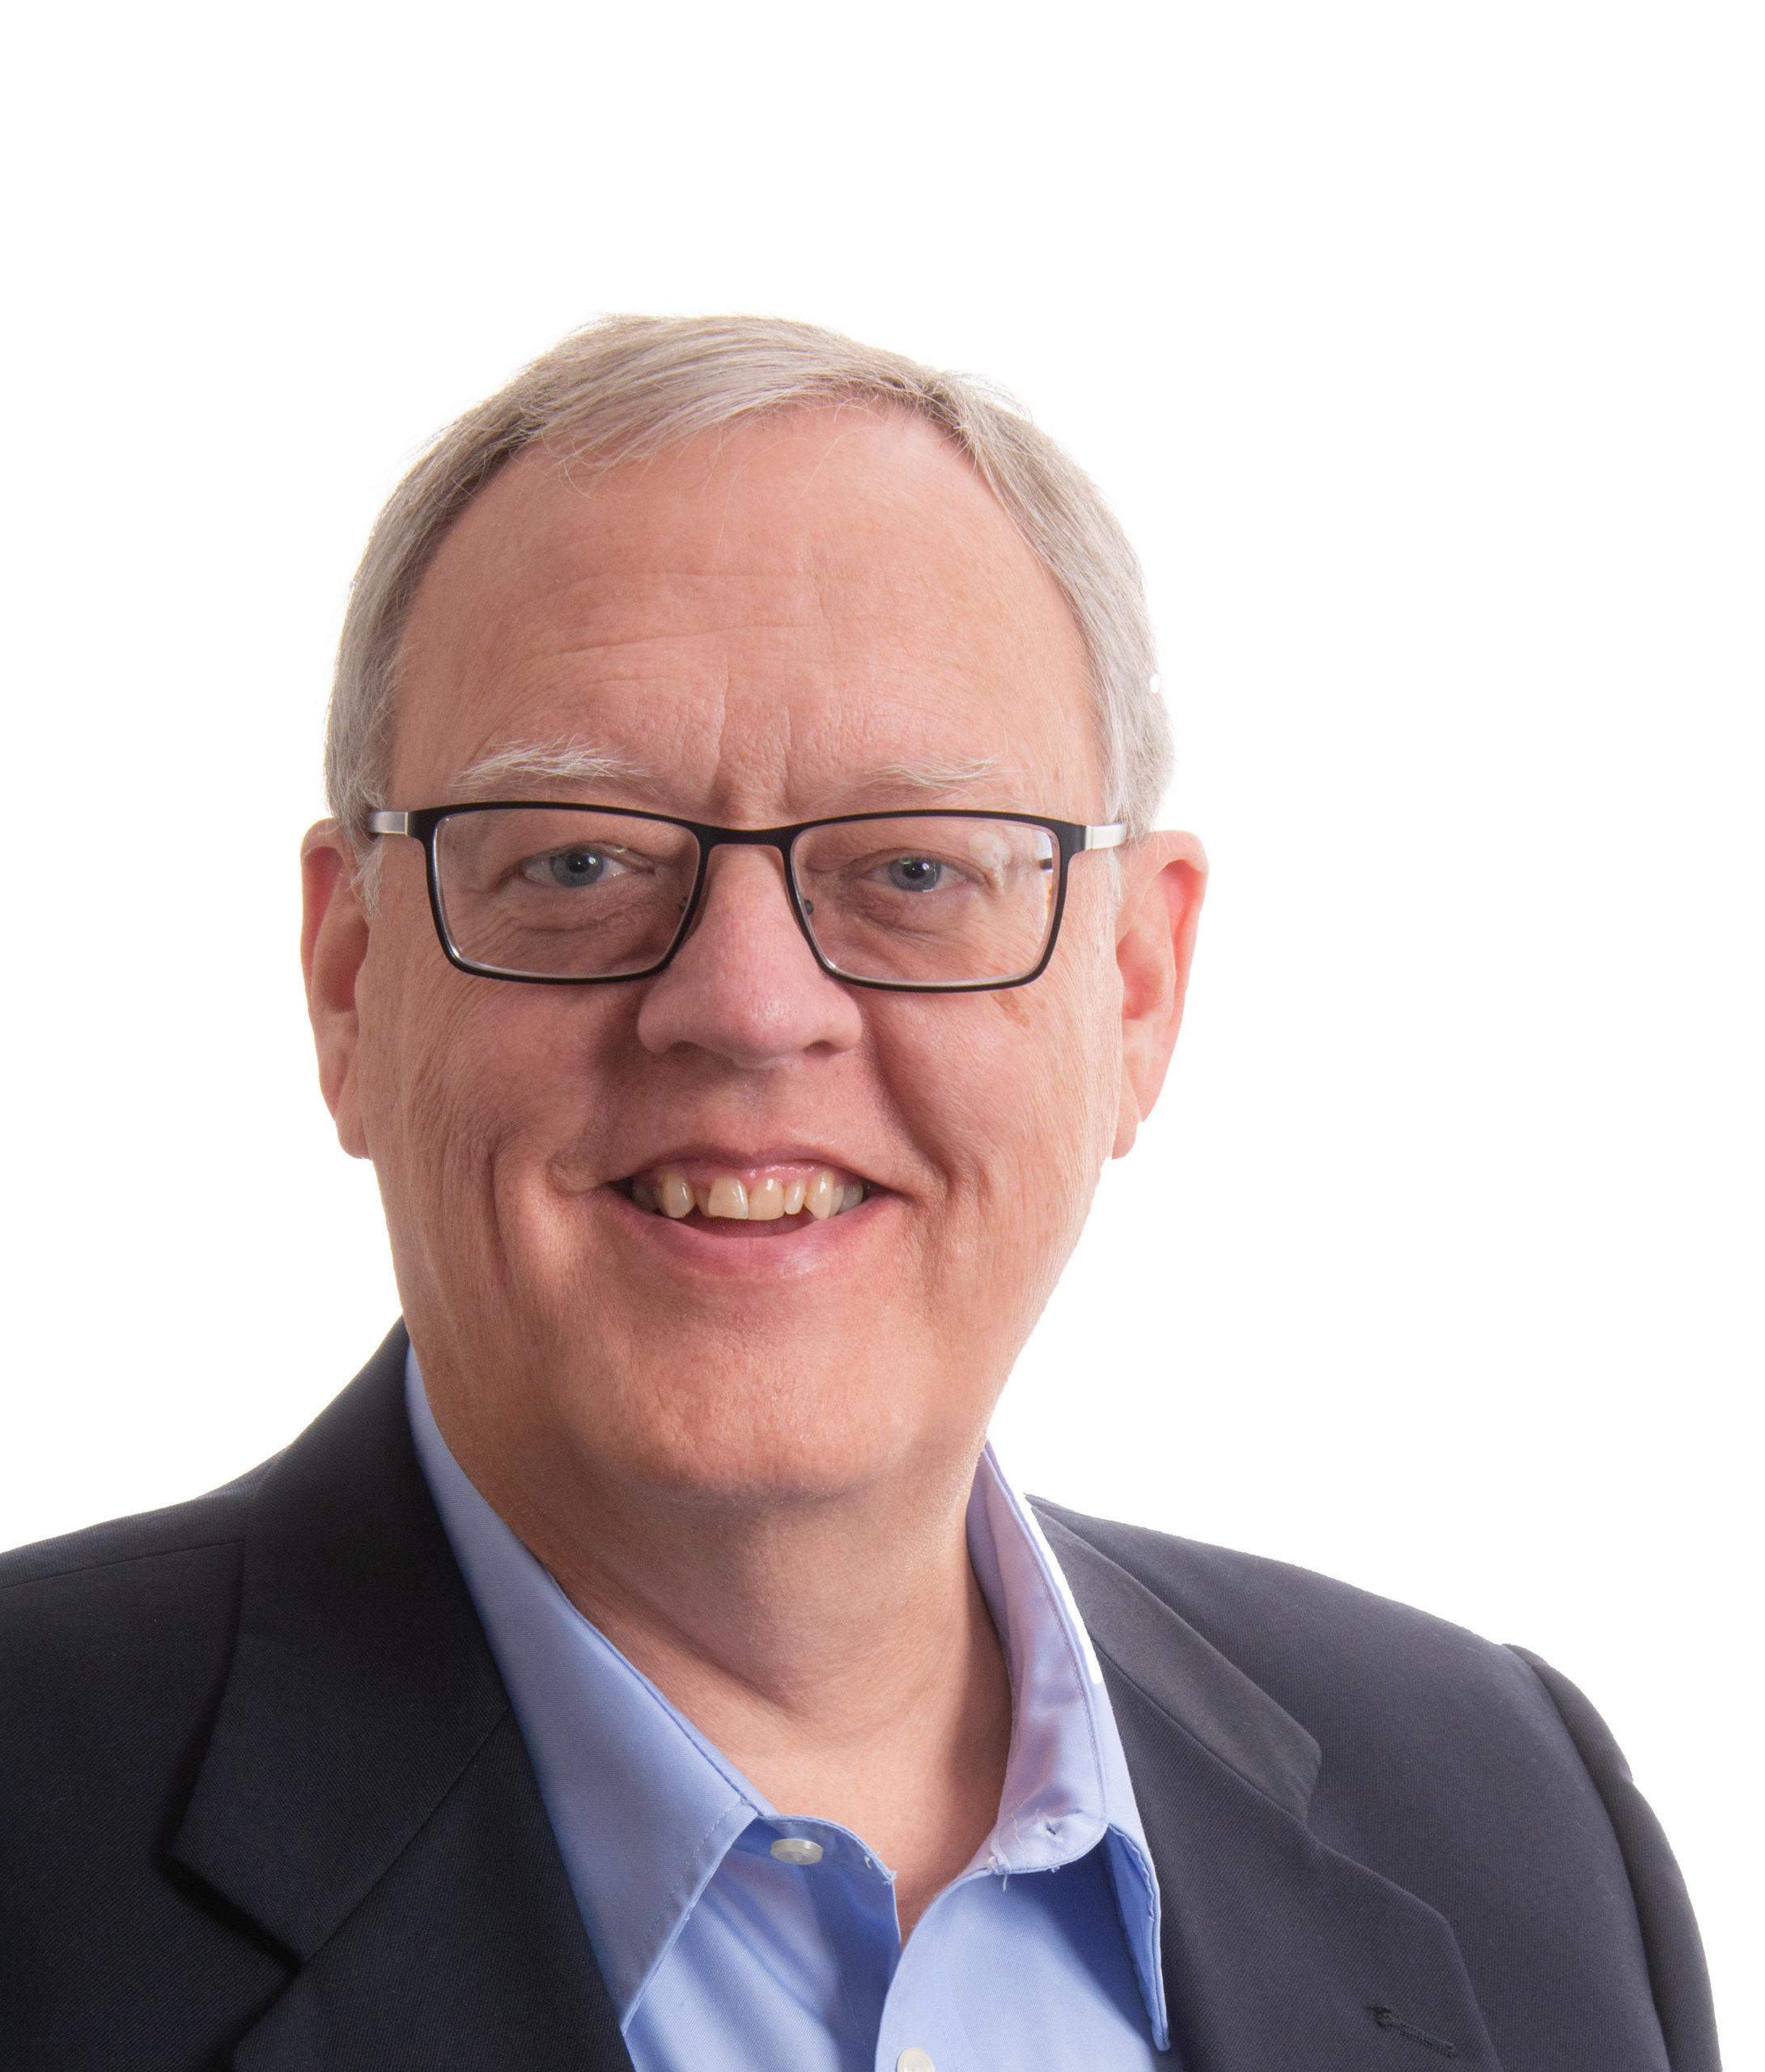 Keith Henkel, CEO of FI Works